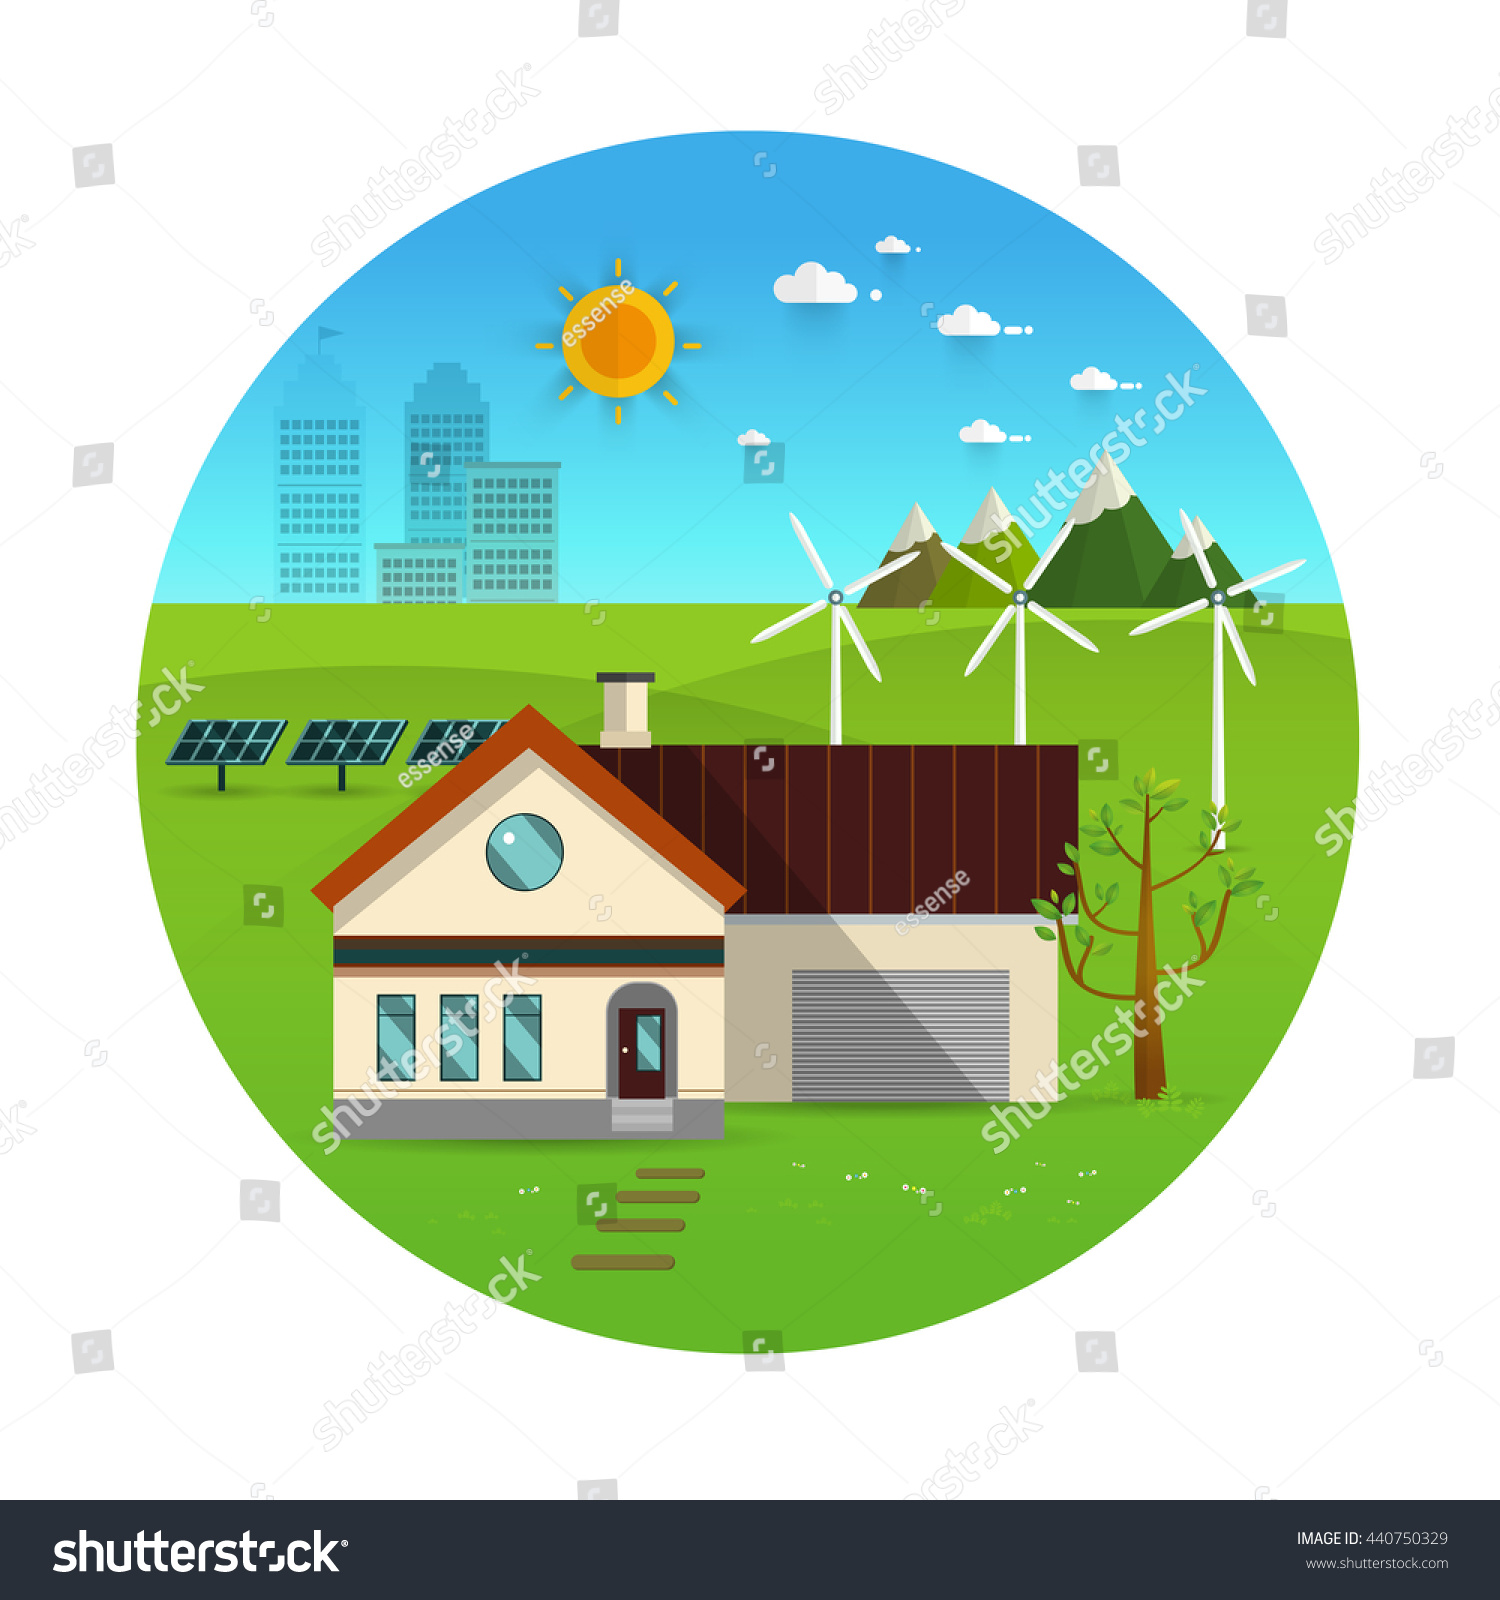 Environmental Concept Earthfriendly Landscapes: Eco Friendly House Solar Energy Wind Stock Vector